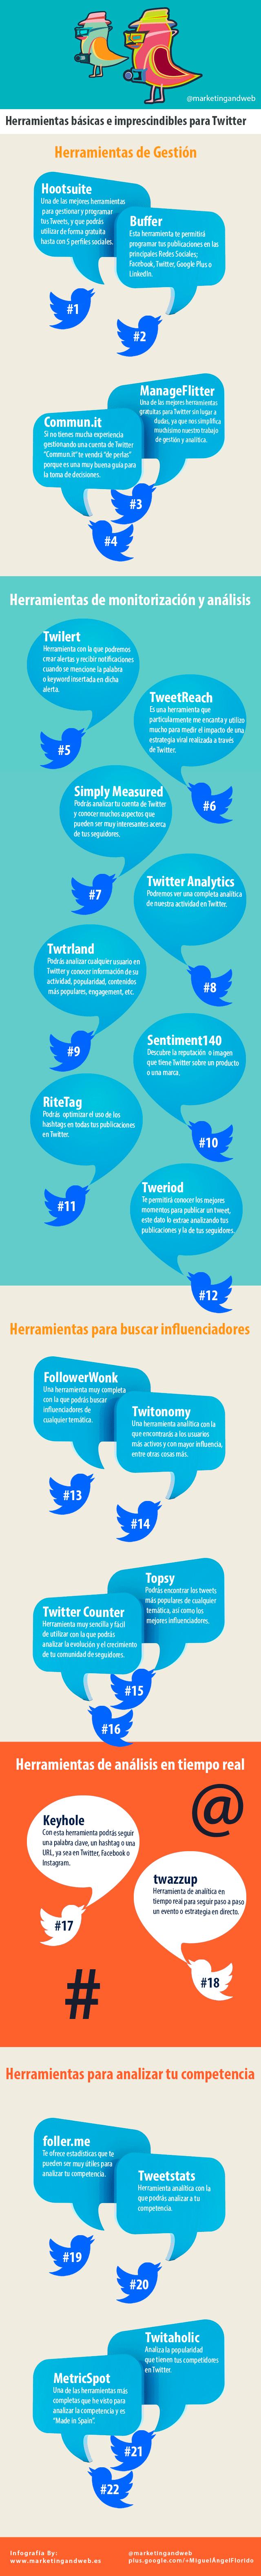 herramientas-basicas-para-twitter-grande